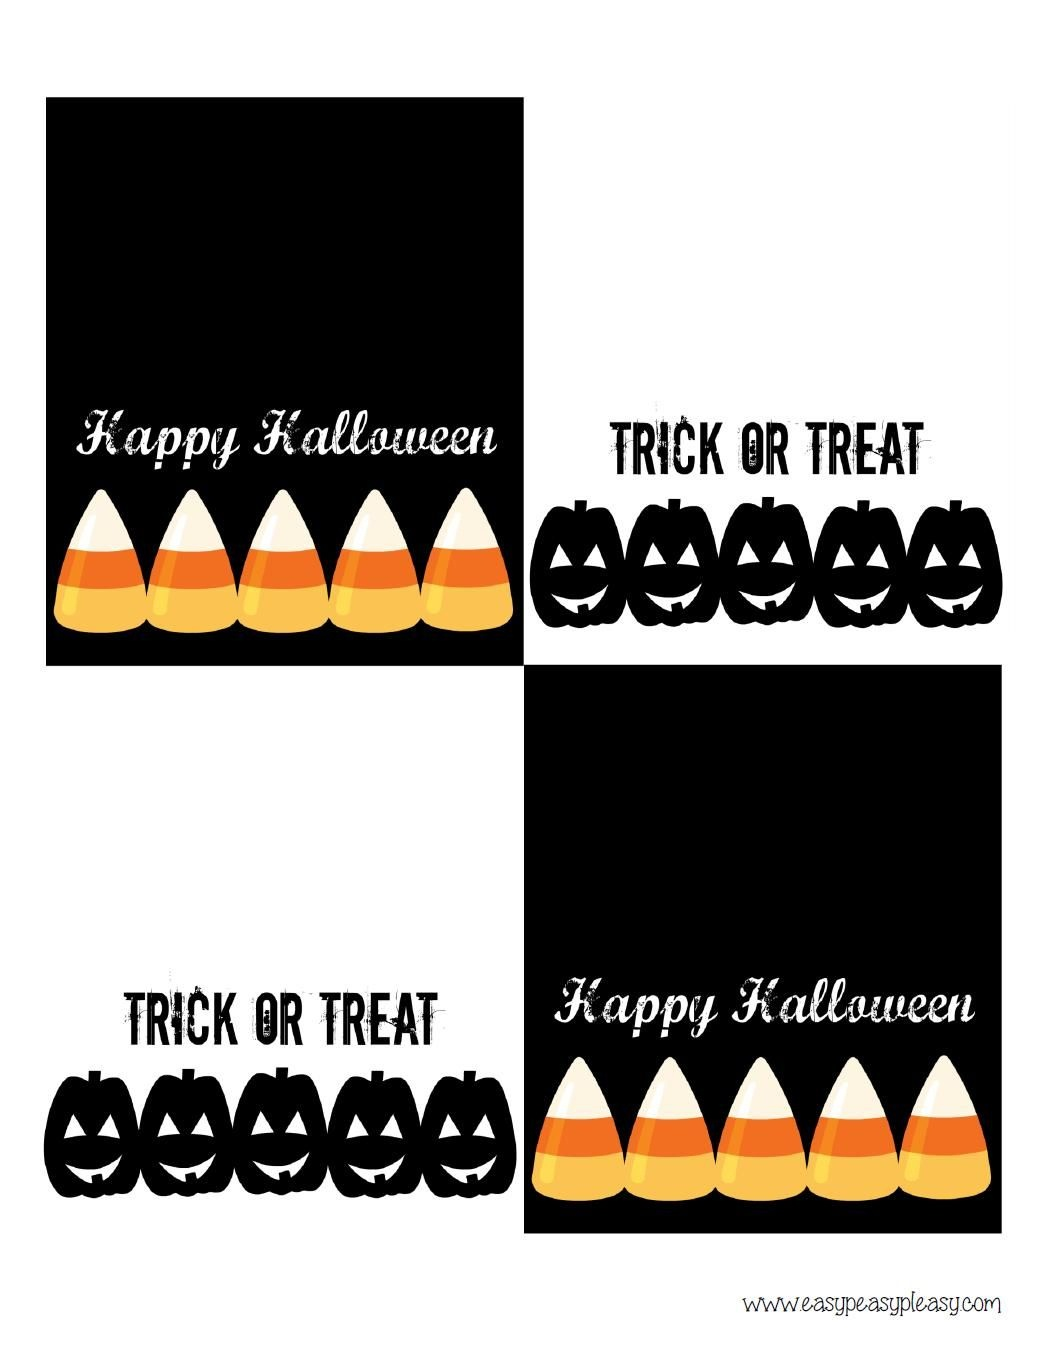 Free Printable Halloween Treat Bag Toppers | Halloween Printables 4 - Free Printable Trick Or Treat Bags